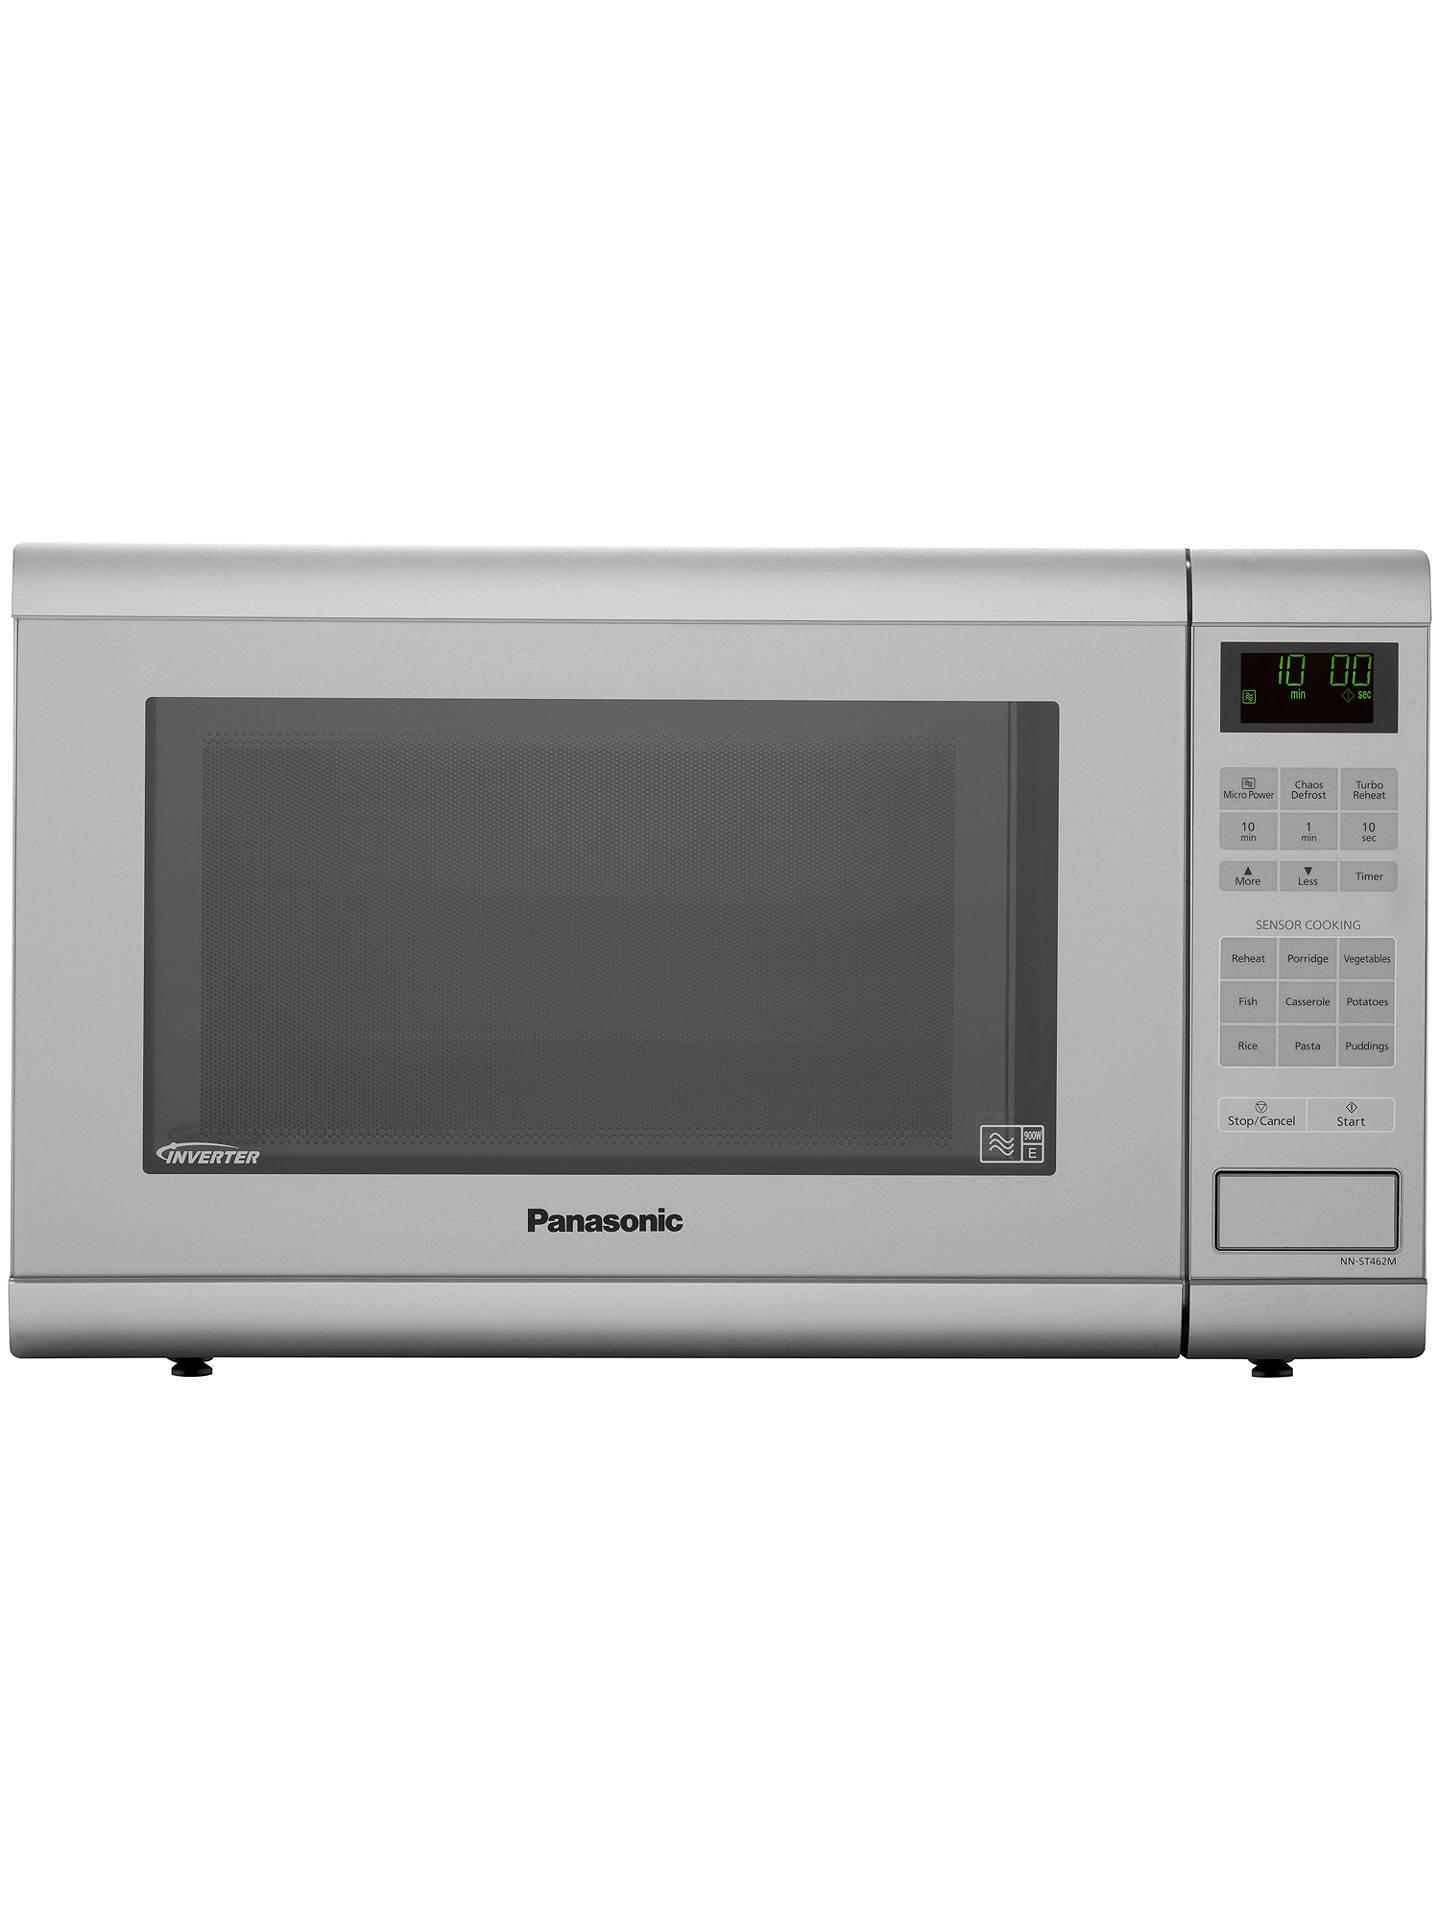 Panasonic NN-ST462MBPQ Microwave, Silver at John Lewis ...